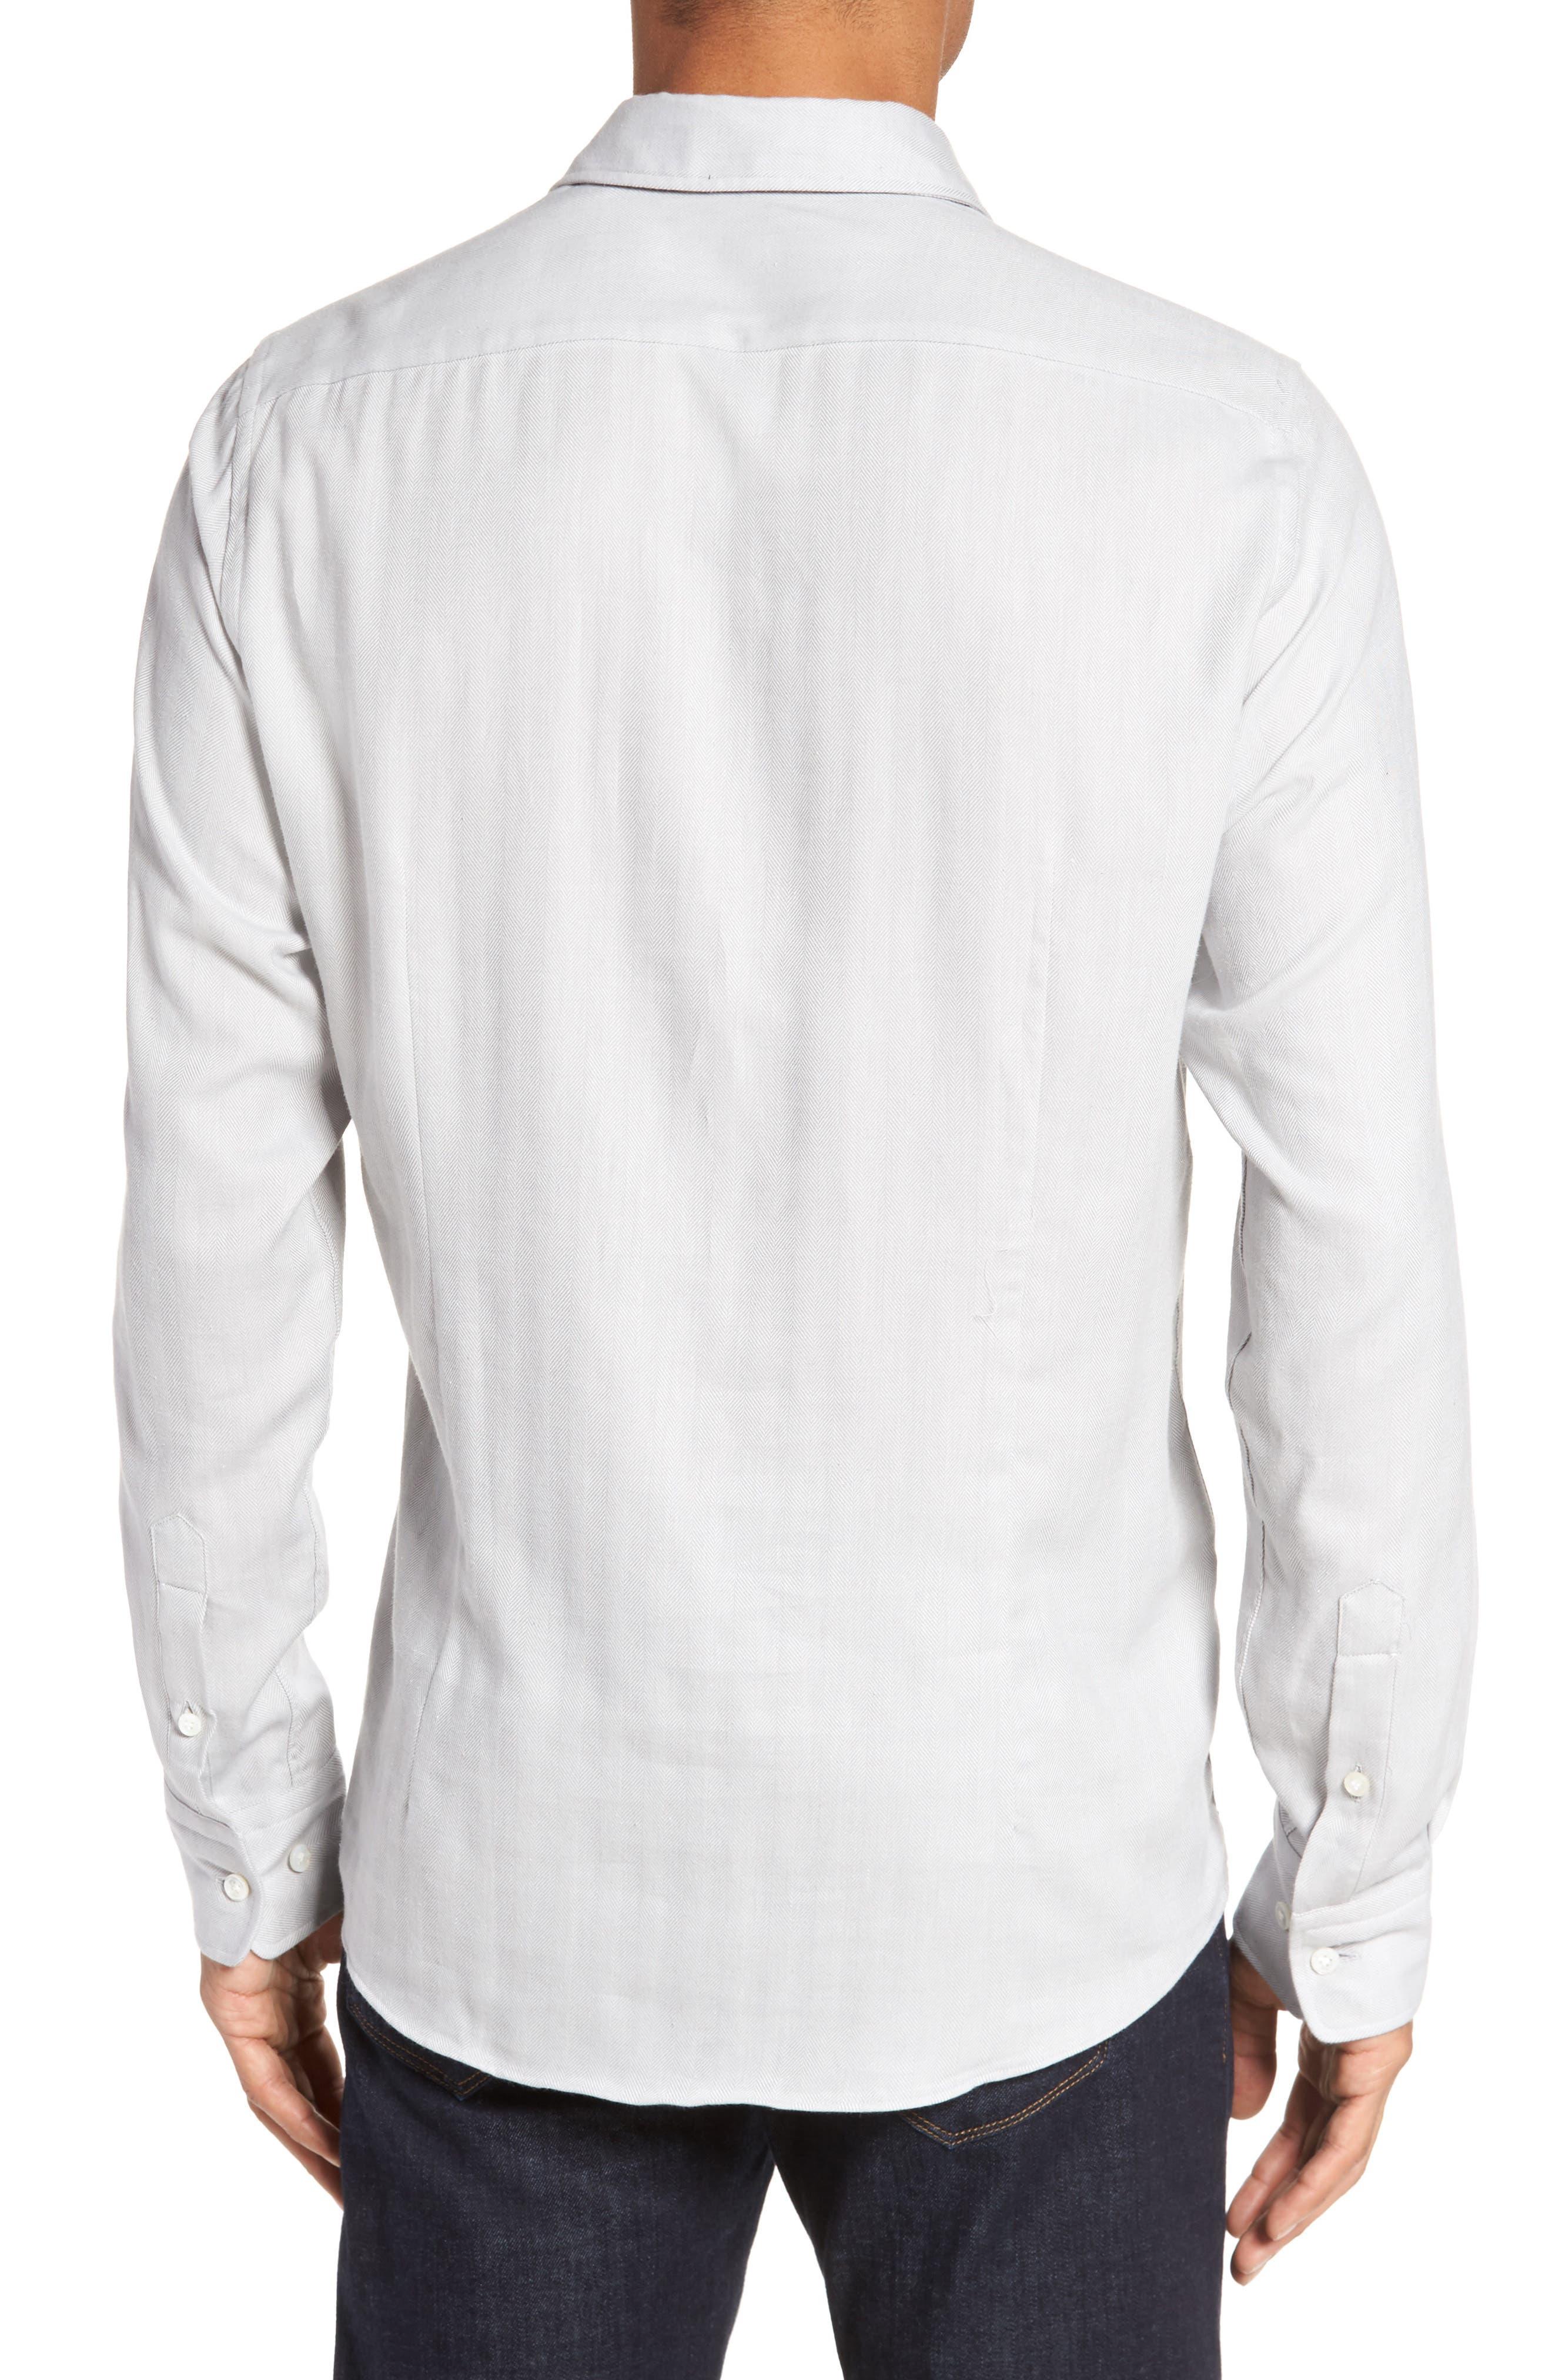 Landon Herringbone Shirt,                             Alternate thumbnail 2, color,